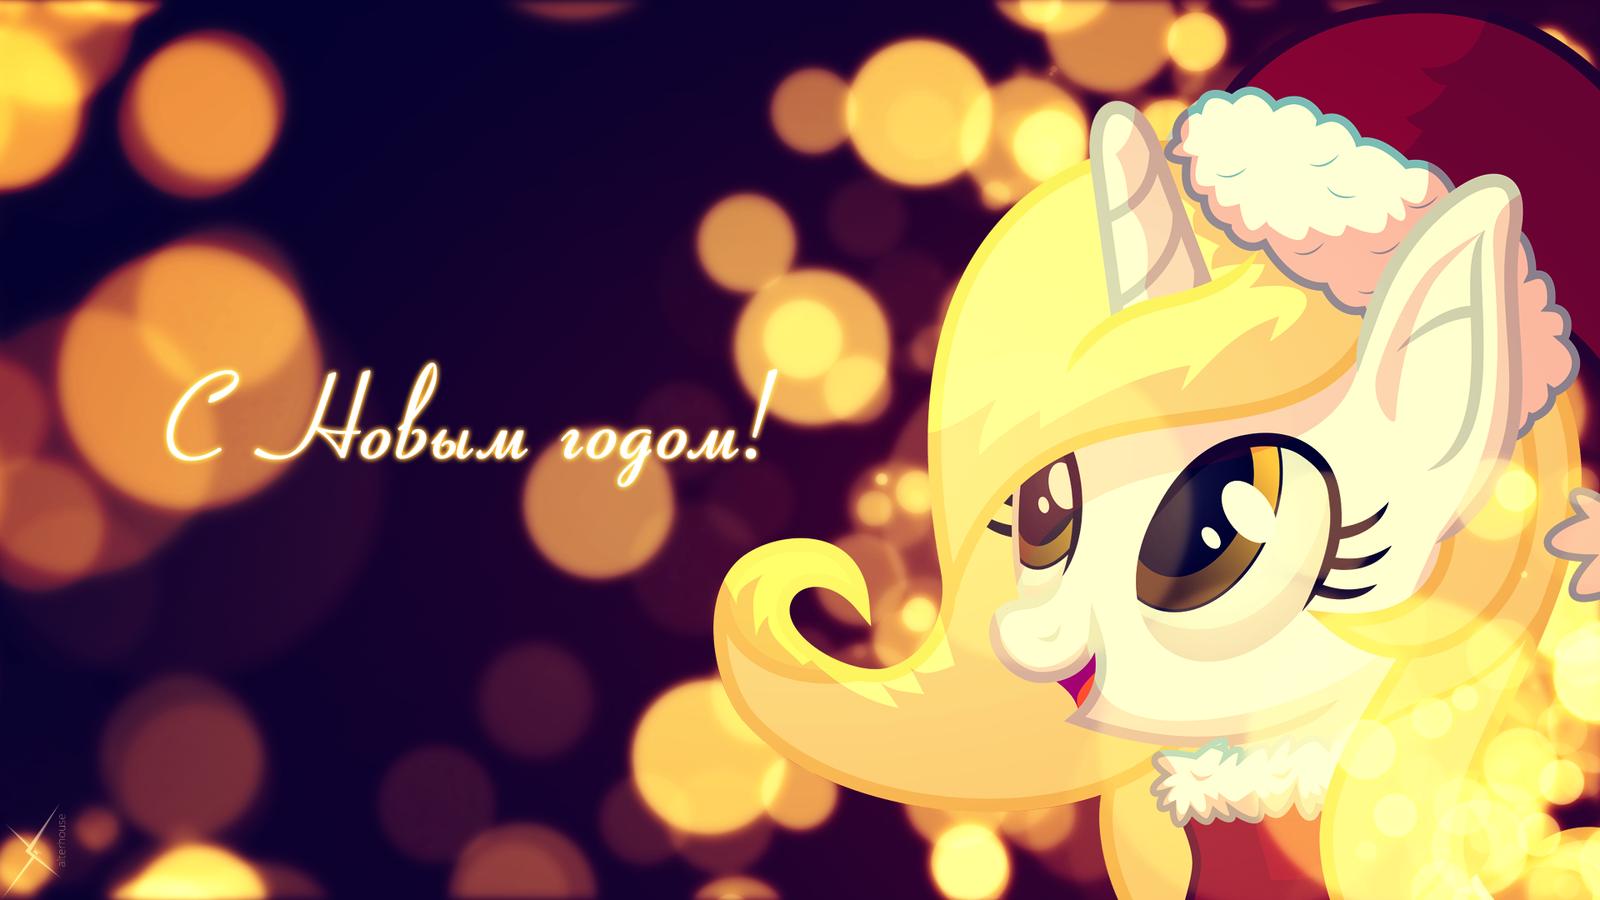 Happy New Year (pony | 2015) by Alterhouse